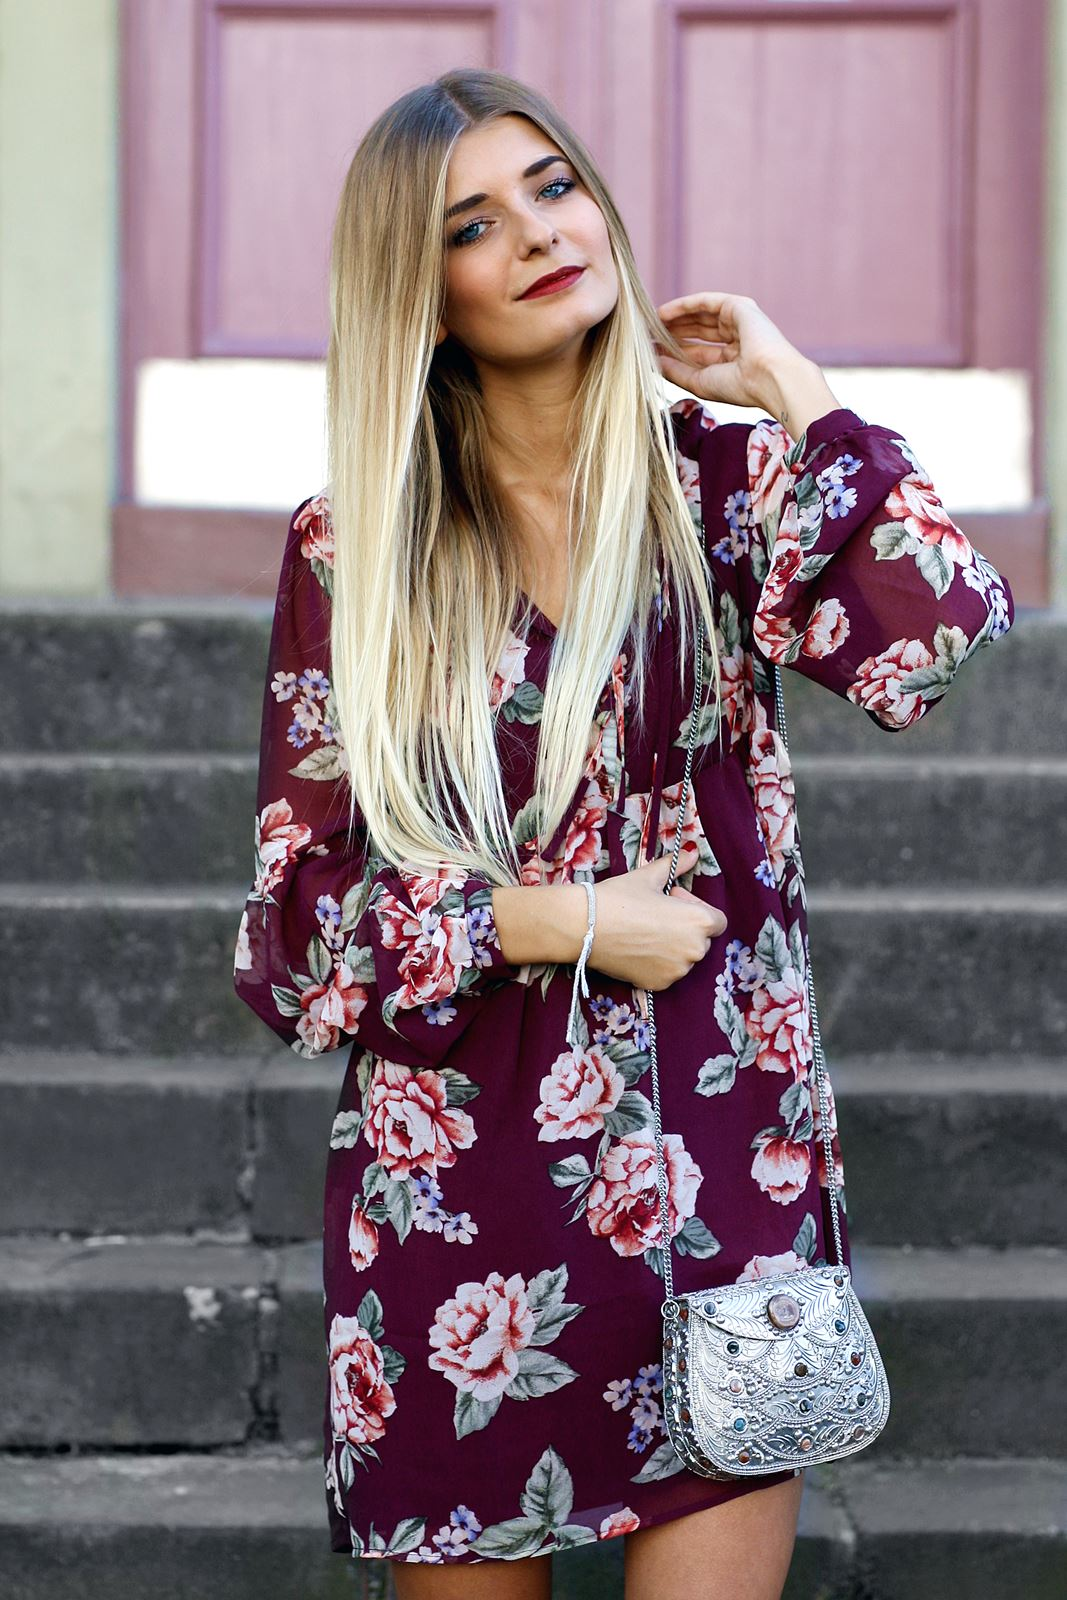 modeblog-german-fashion-blog-outfit-stiefeletten-rotes-blumenkleid-6